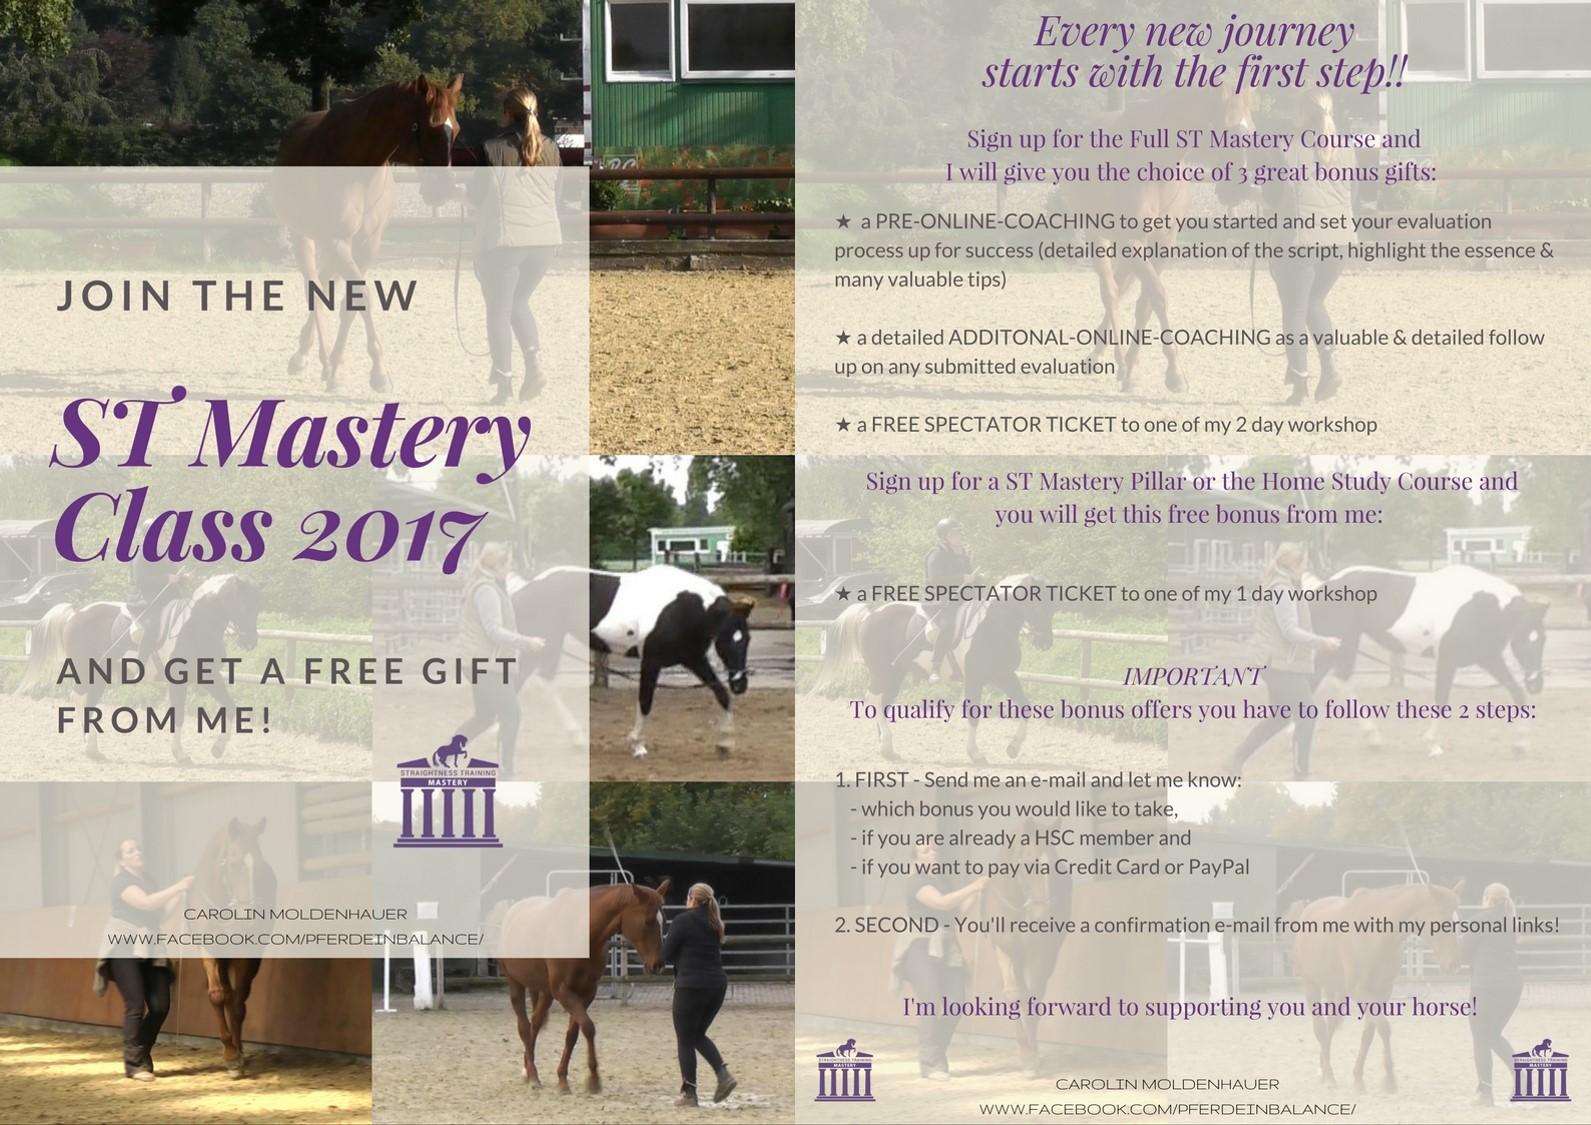 ST Mastery Class 2017 engl. final